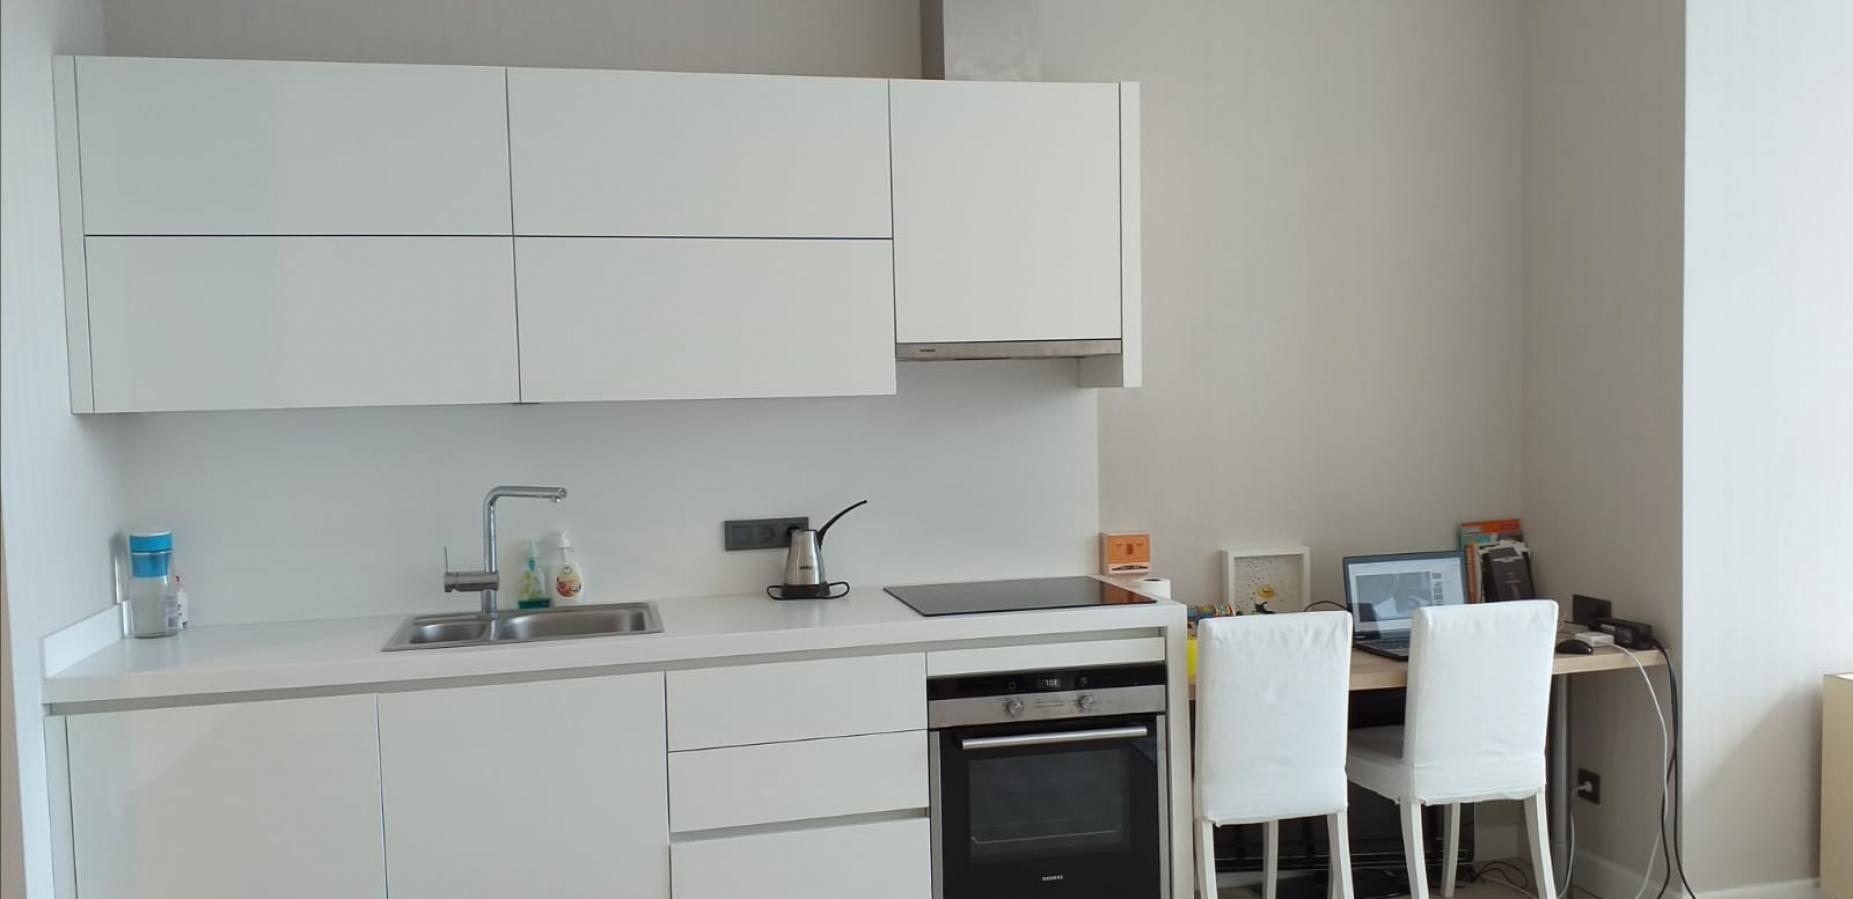 SKYLAND İSTANBUL  KONUT  1 + 0 67 m²